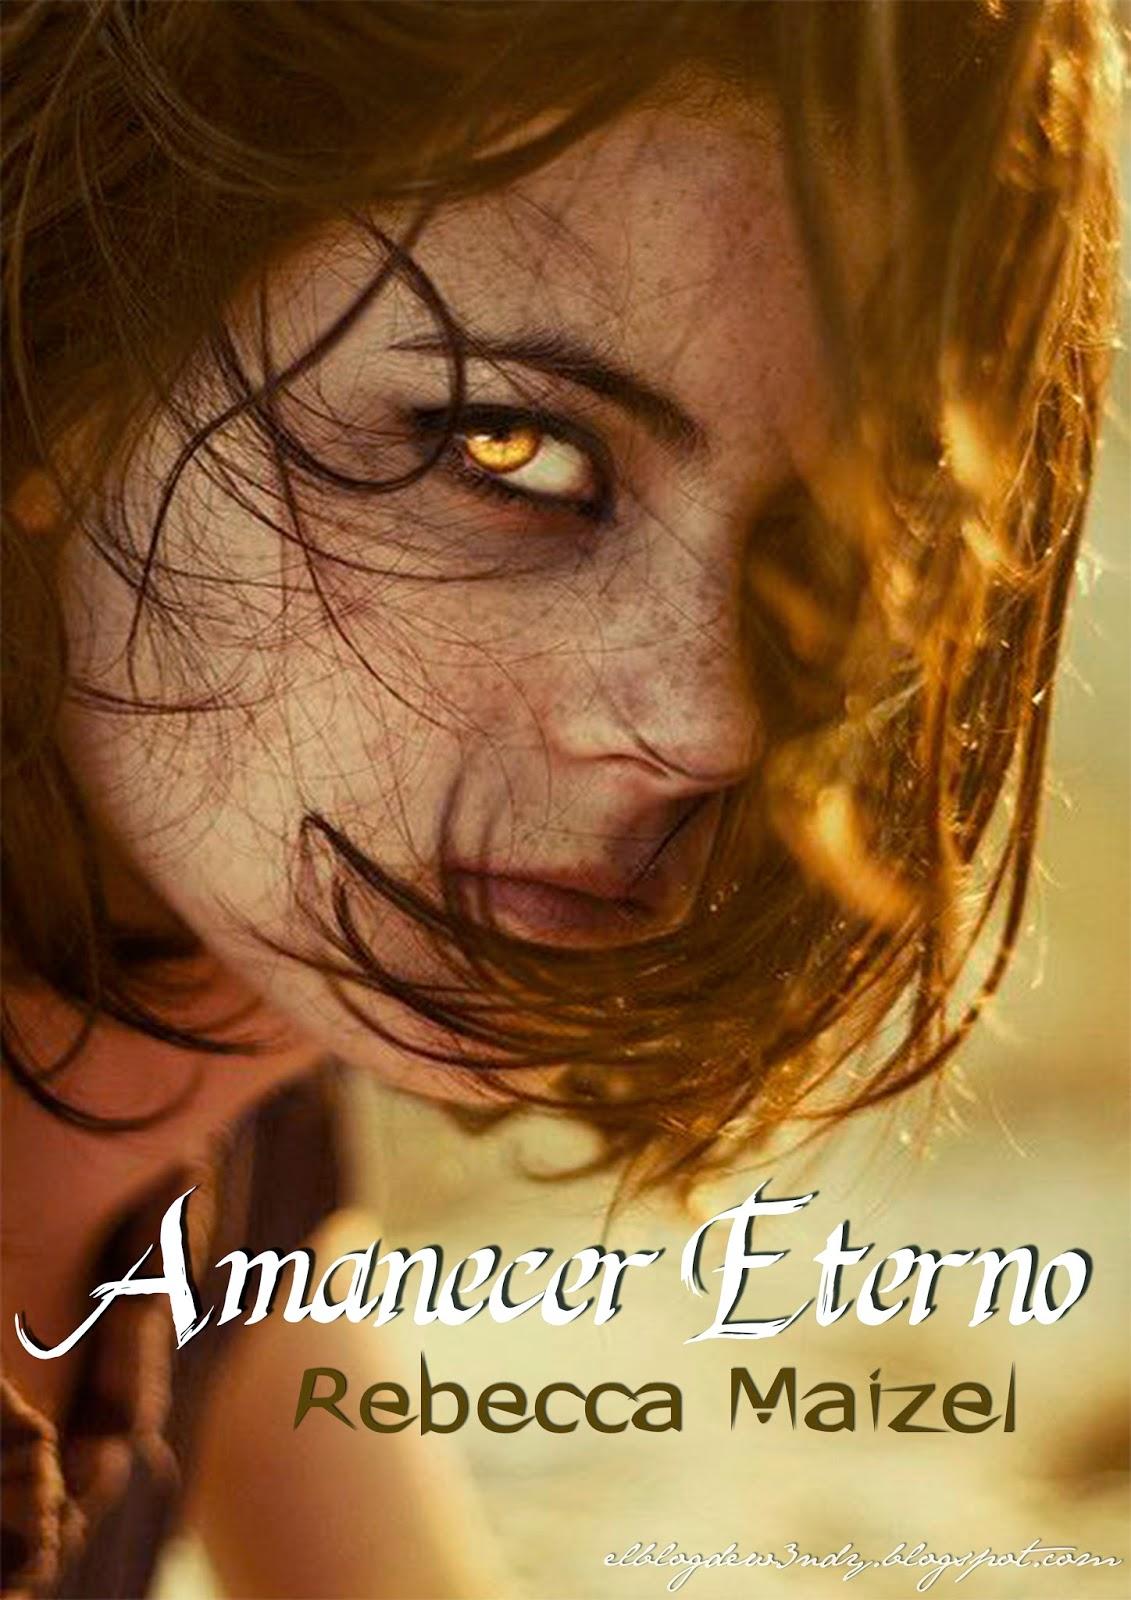 http://elblogdew3ndy.blogspot.com/2015/04/resena-expres-amanecer-eterno-rebecca.html